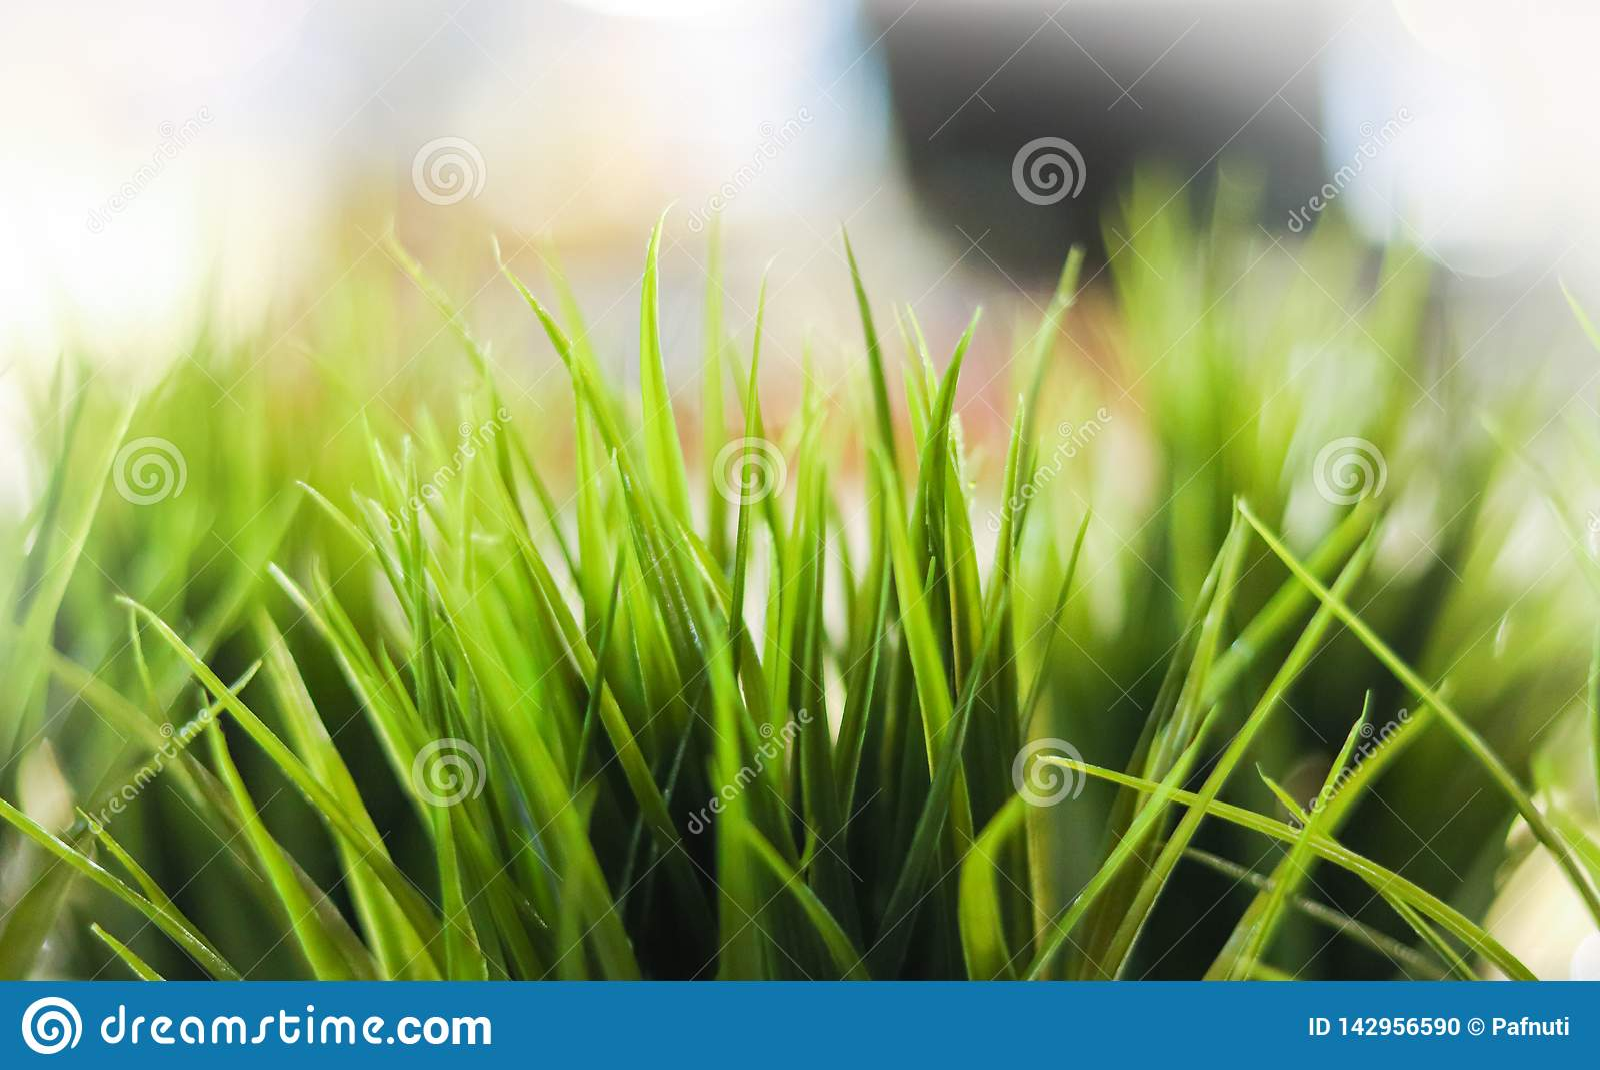 Close-up decorative green grass indoor.